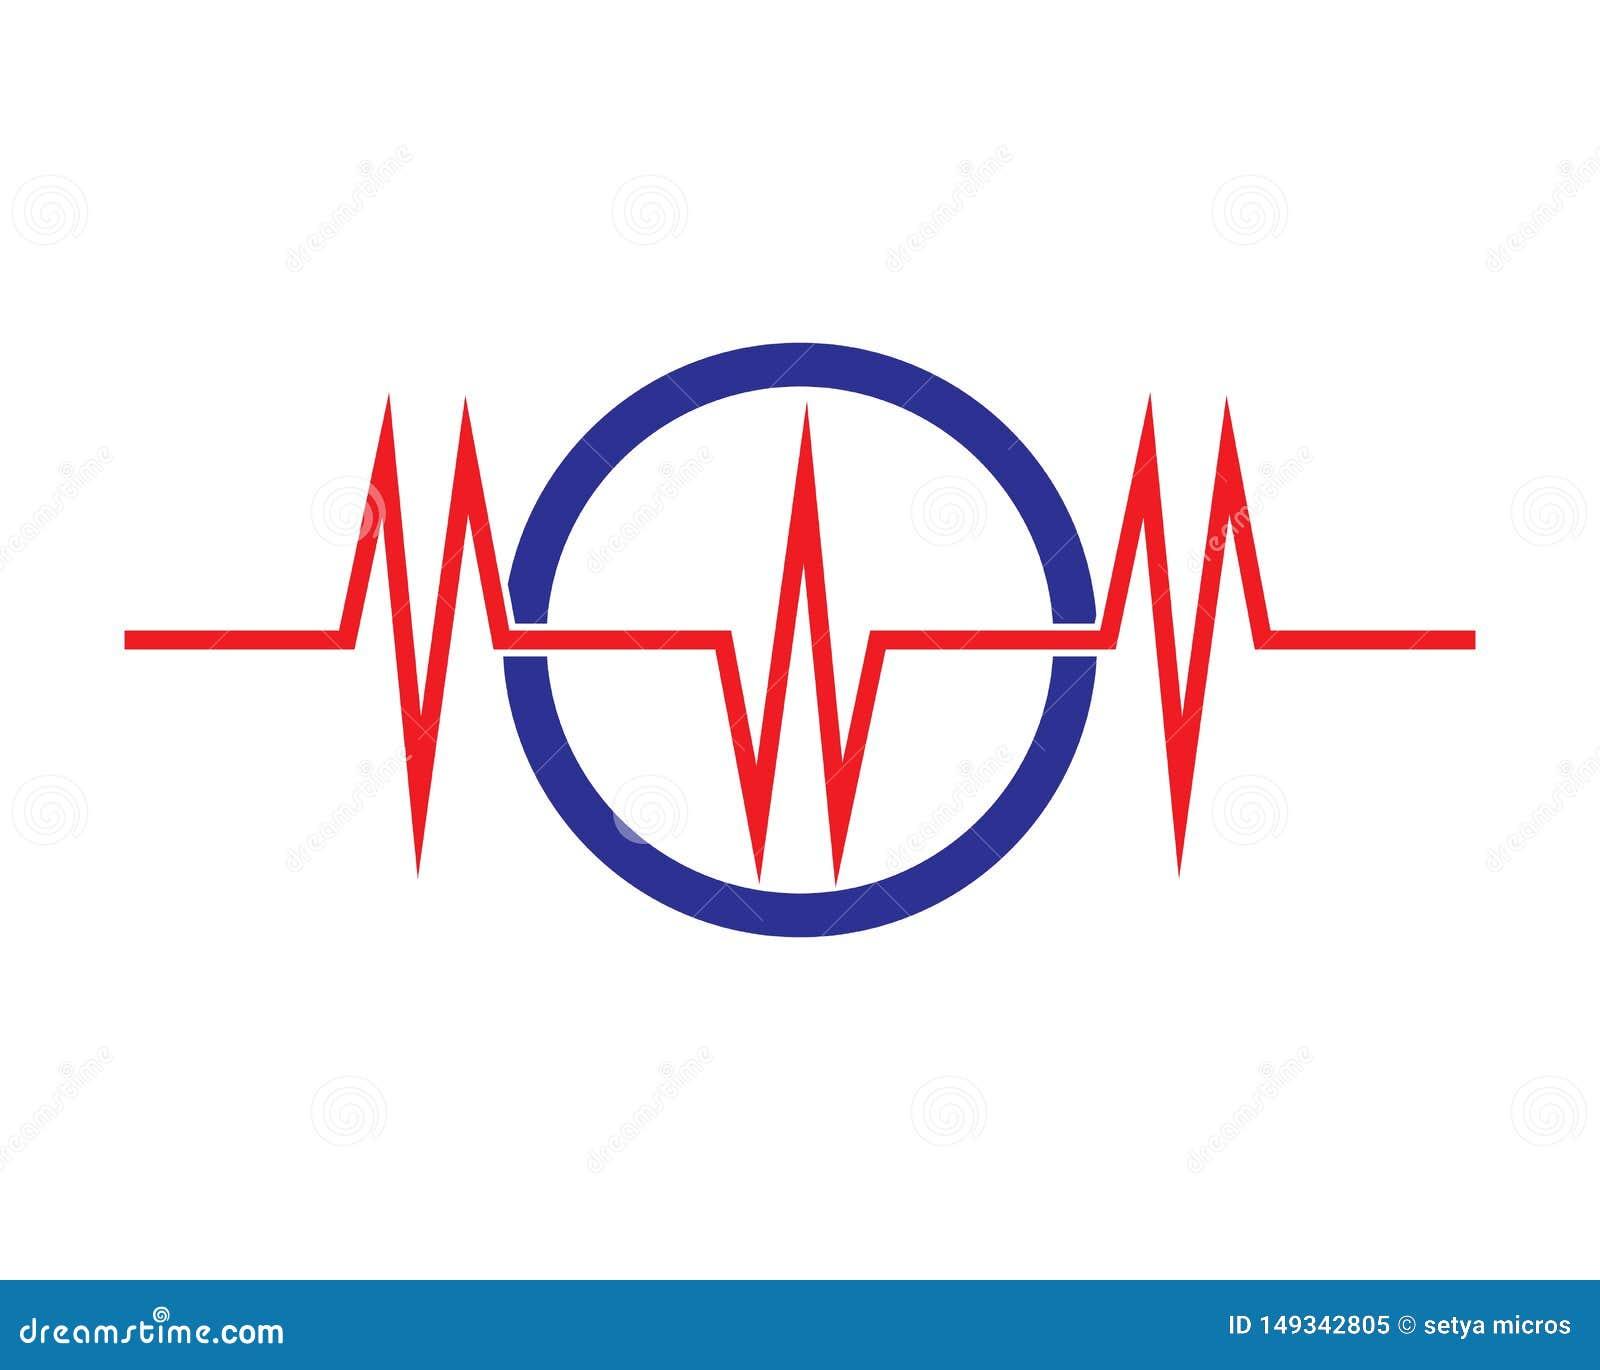 sound wave ilustration logo